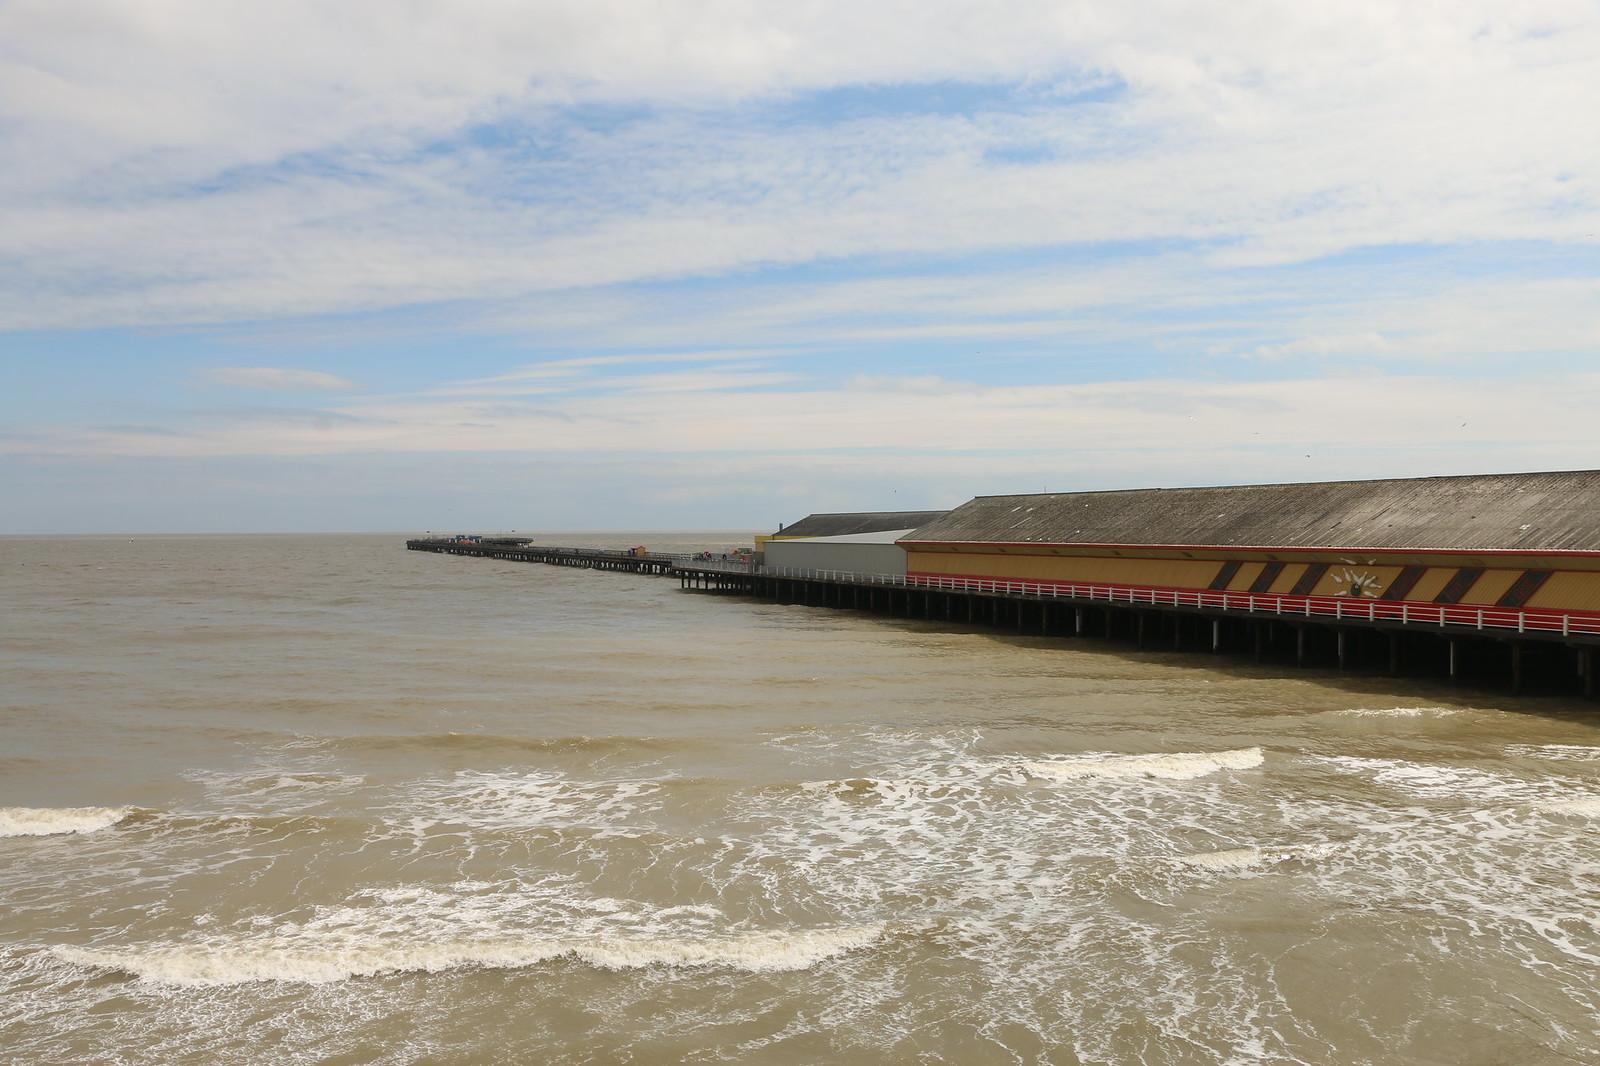 Walton Pier, Walton-on-the-Naze